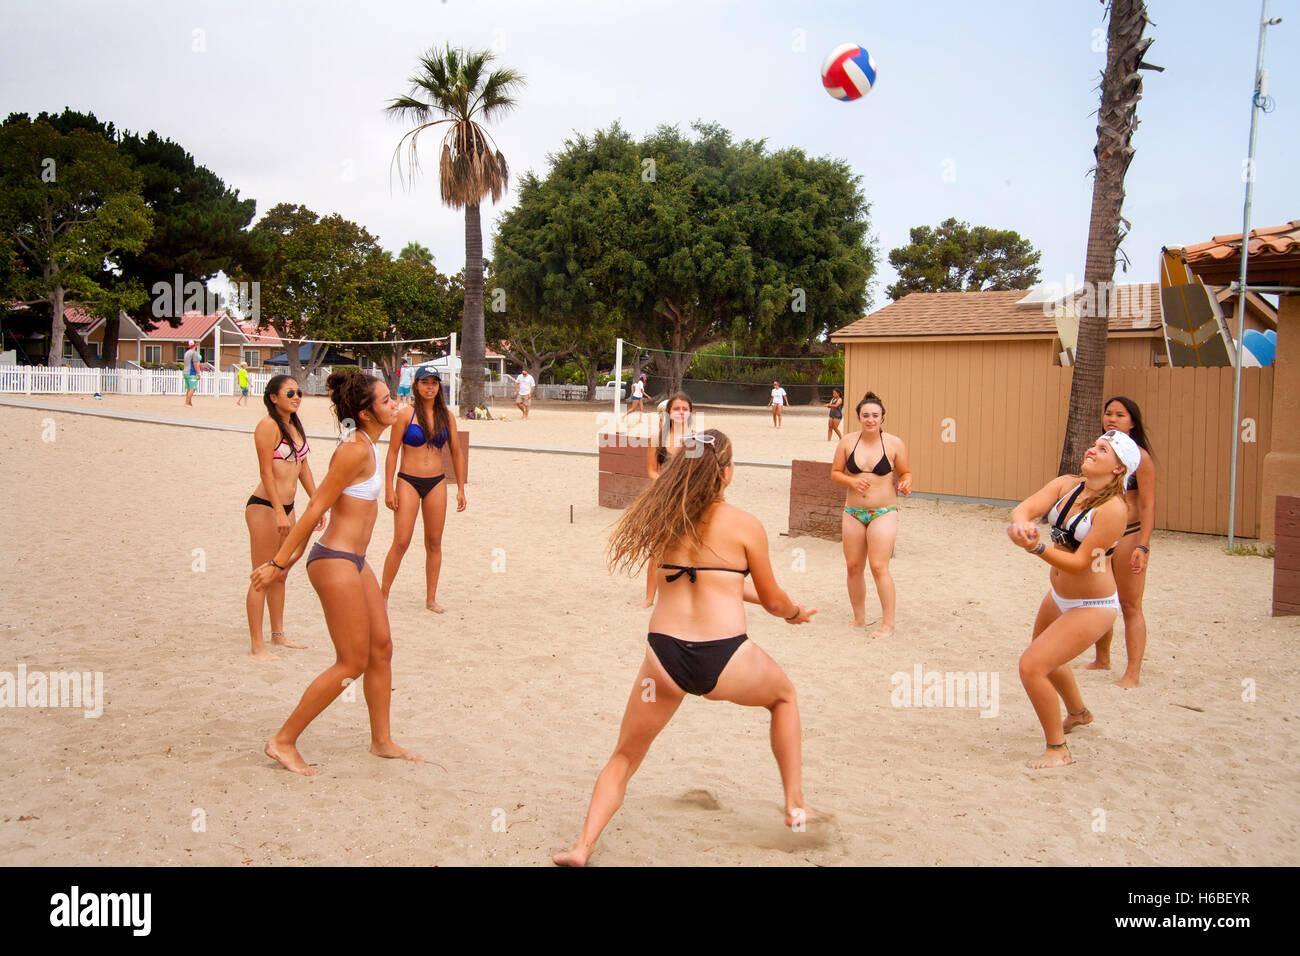 Mädchen ohne bikini